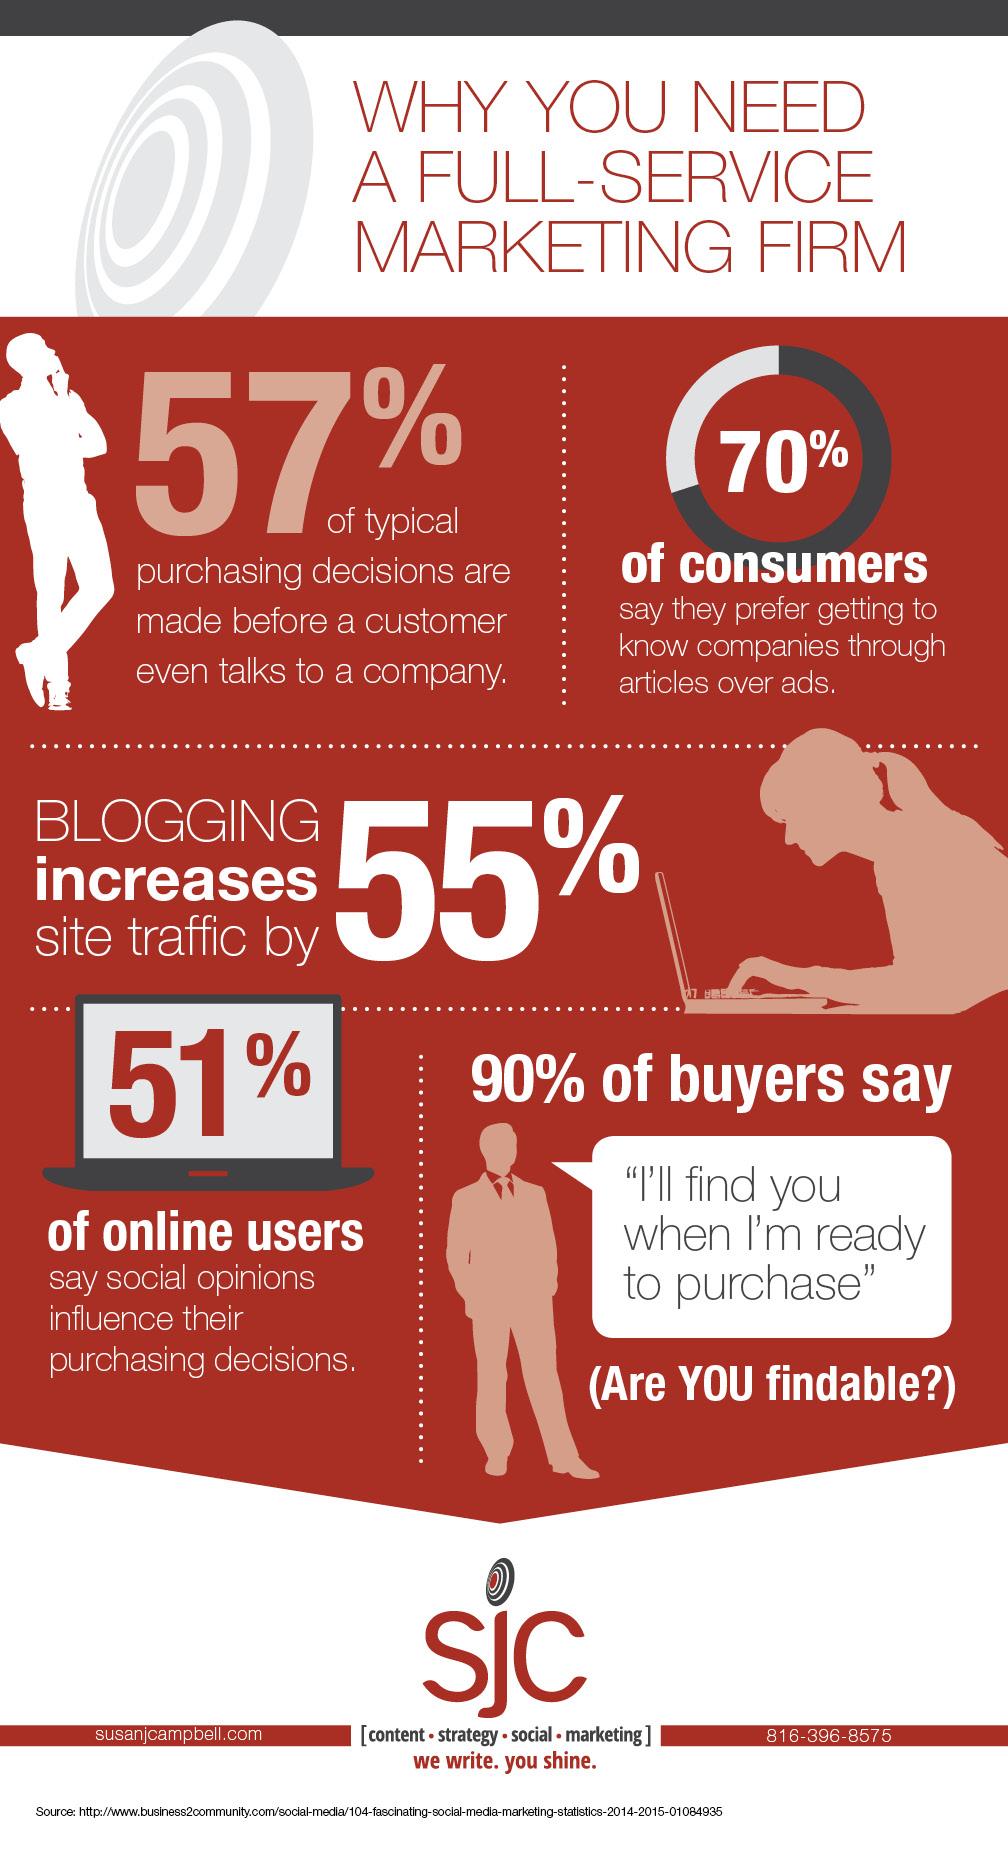 SJC infographic_full service marketing